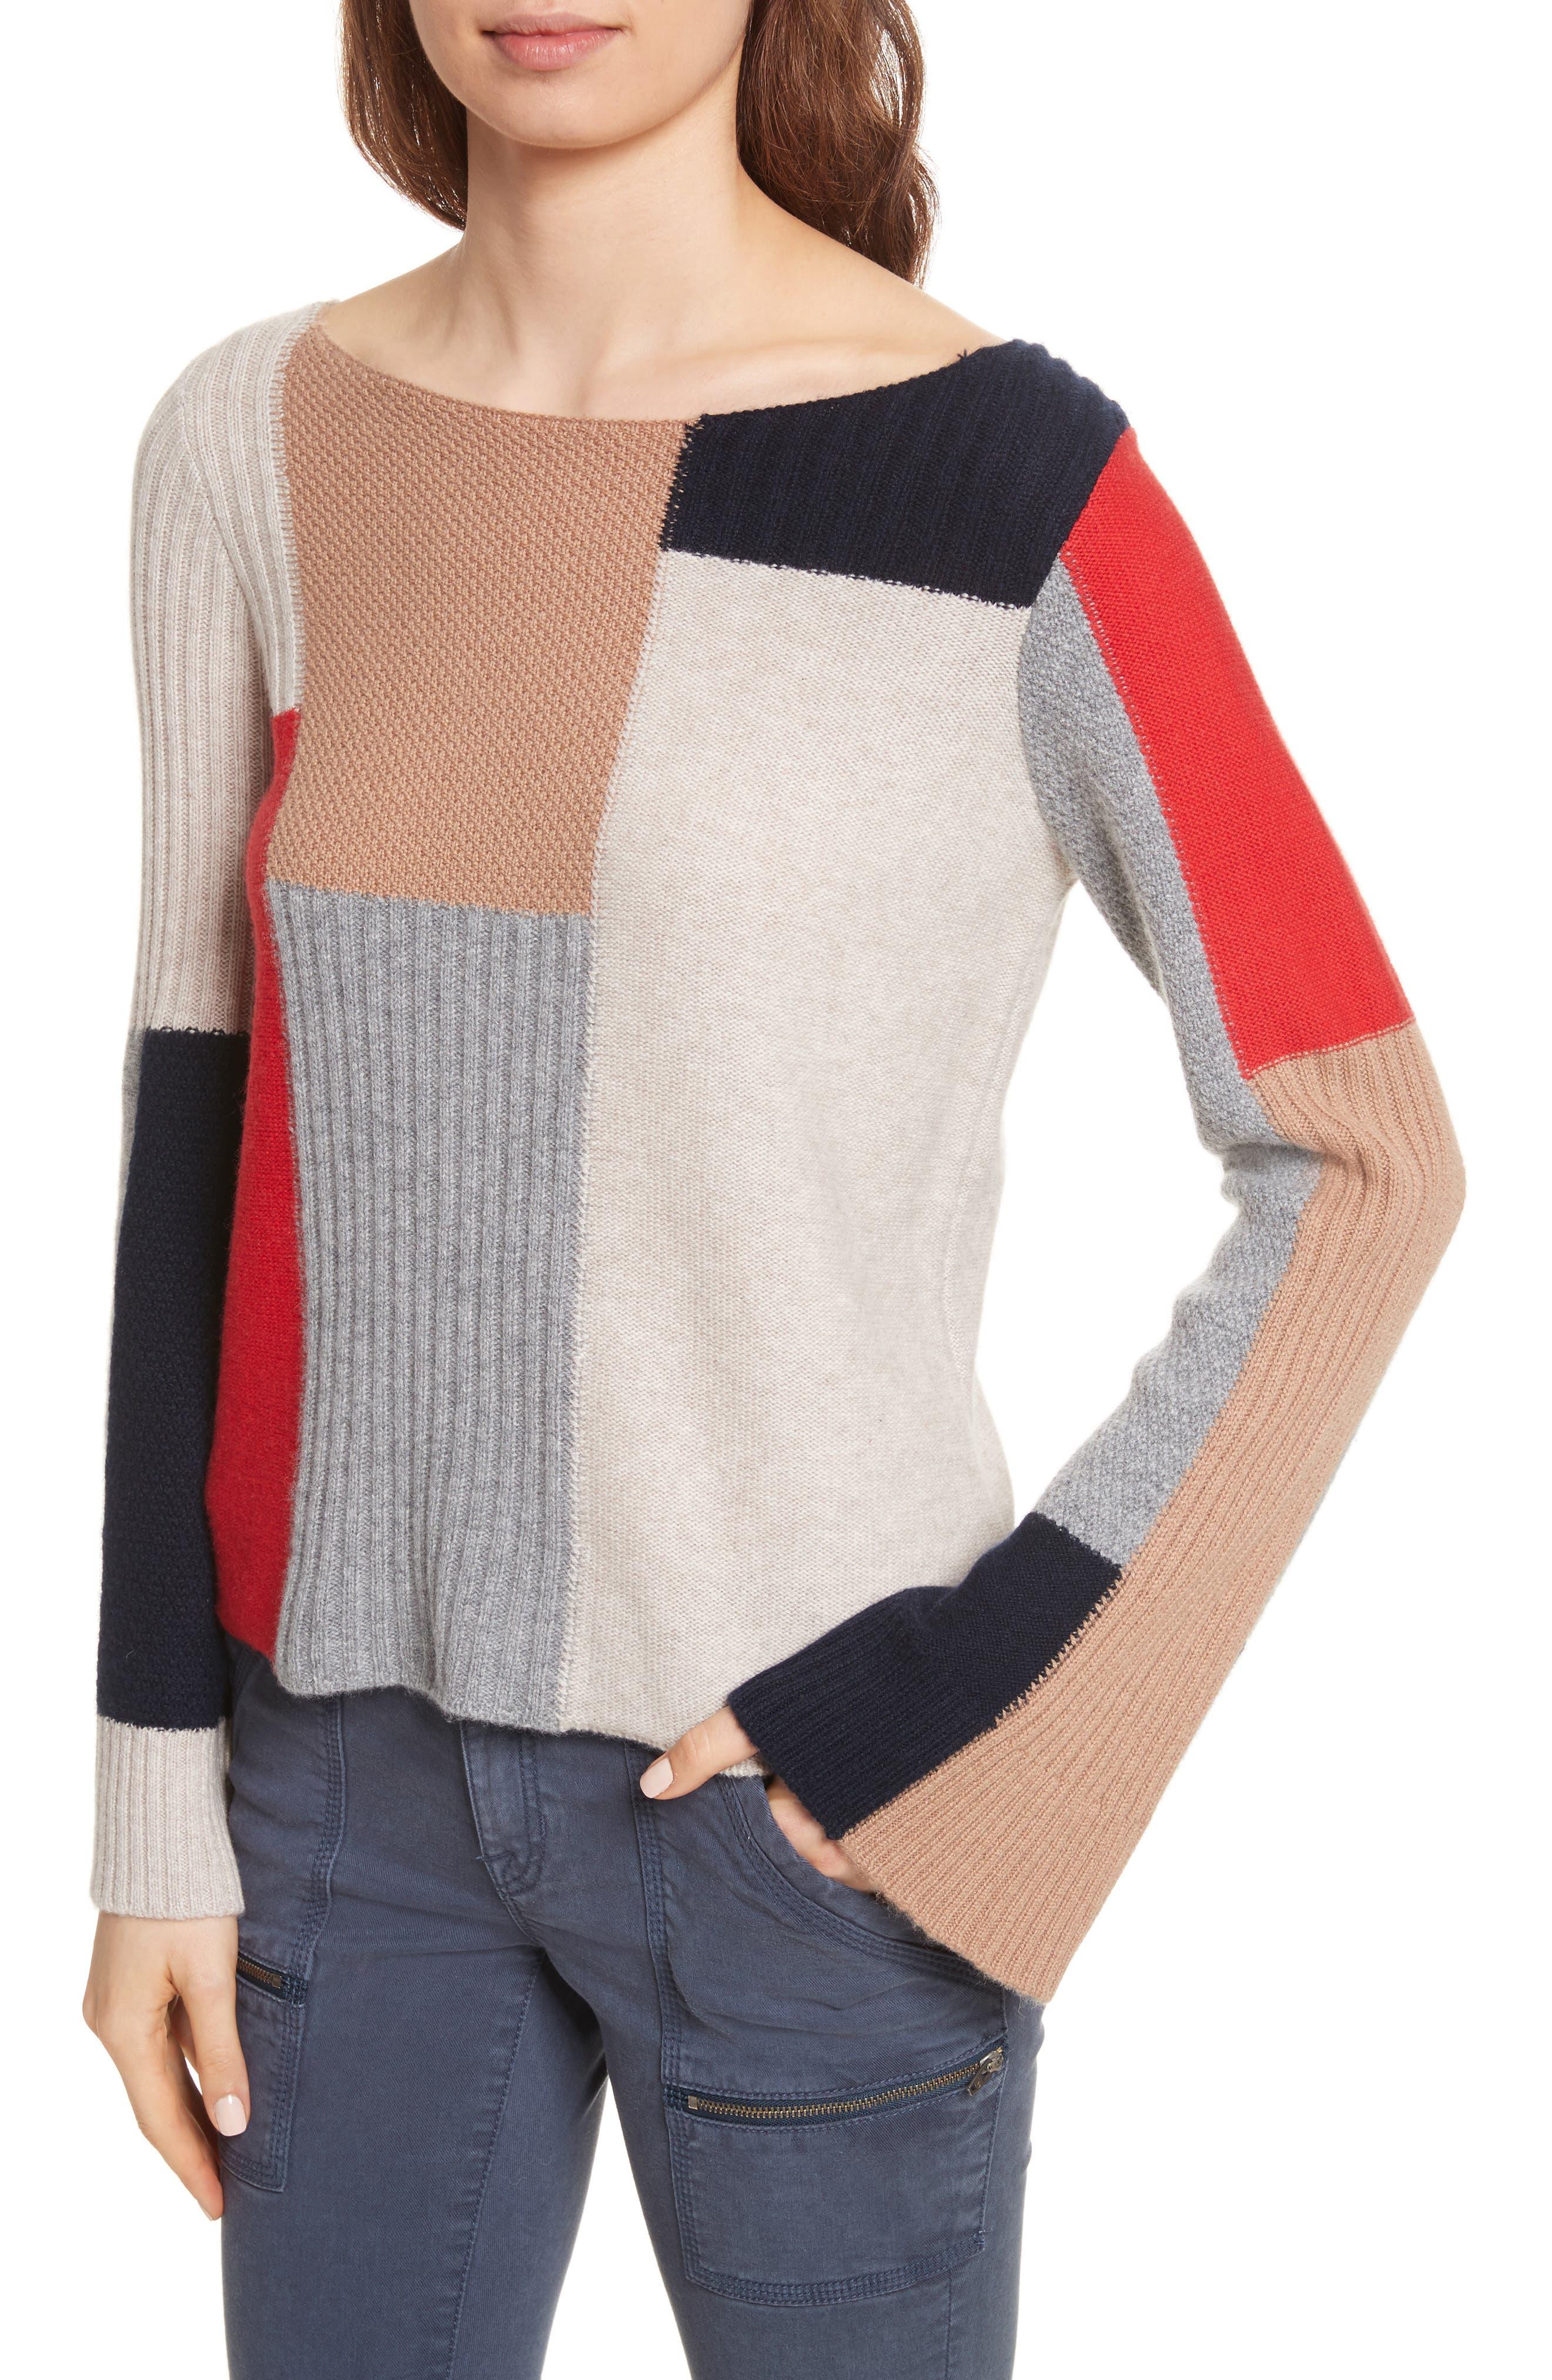 Adene Wool & Cashmere Sweater,                             Alternate thumbnail 4, color,                             641